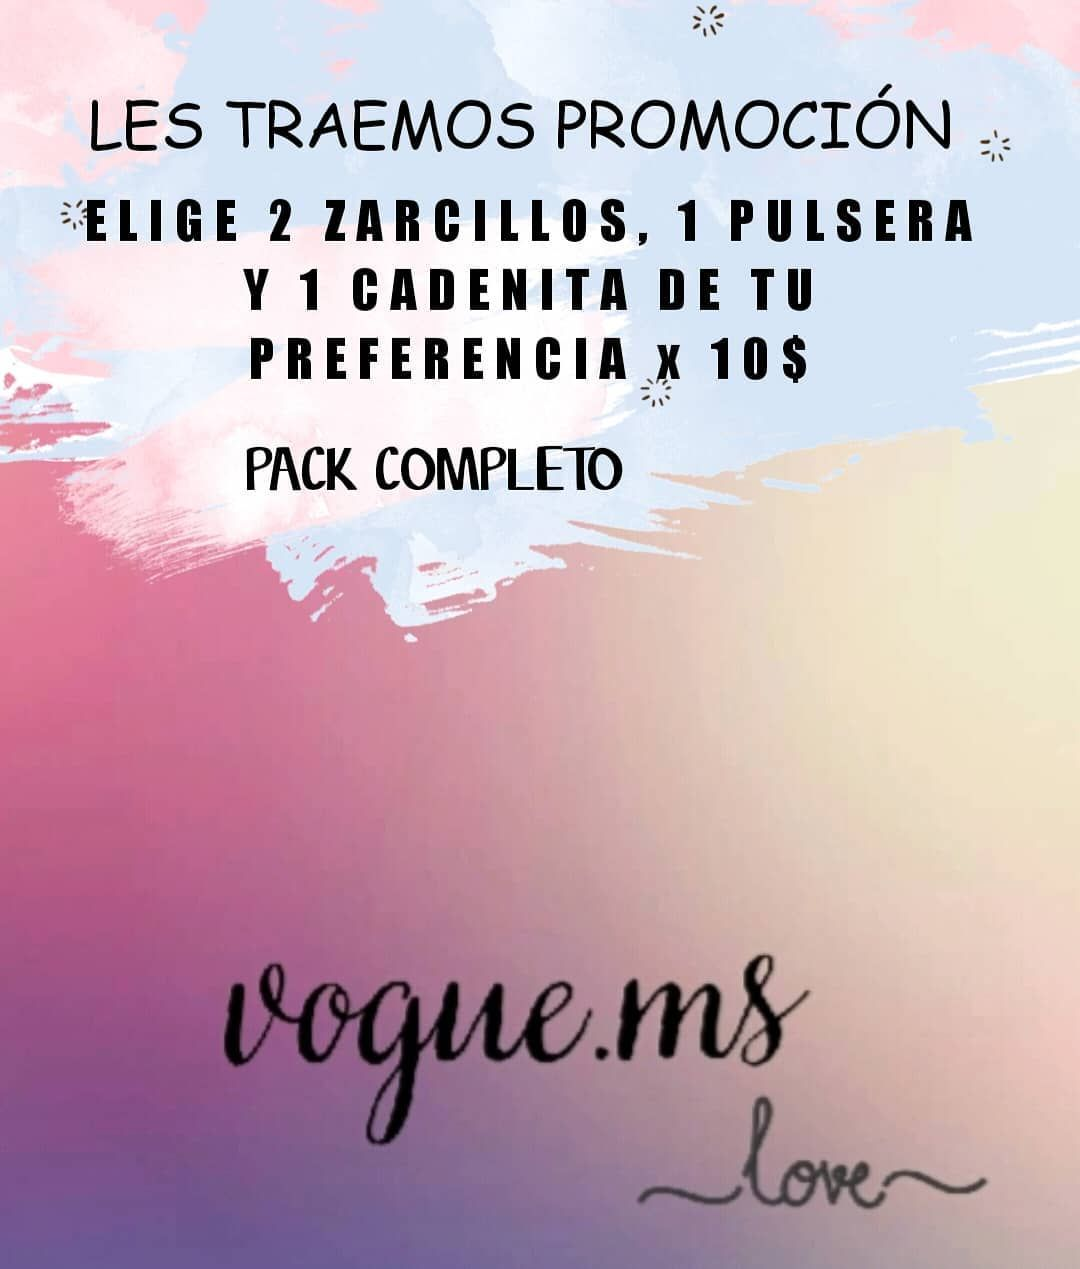 LES TRAEMOS ESTA IMPERDIBLE PROMOCIÓN QUE DURARA TODA LA SEMANA 😍🎊 •Contáctanos: 📲: 04249577189 . . .  #diseñovenezolano #vogue #love #lifestyle #amore #parche #nude #fashion #post #ptordaz #ptolacruz #pretty #happy #girl #parches  #amor #design #girl #girlpowers  #mommy #mom #happyday #day #gooday #outfit